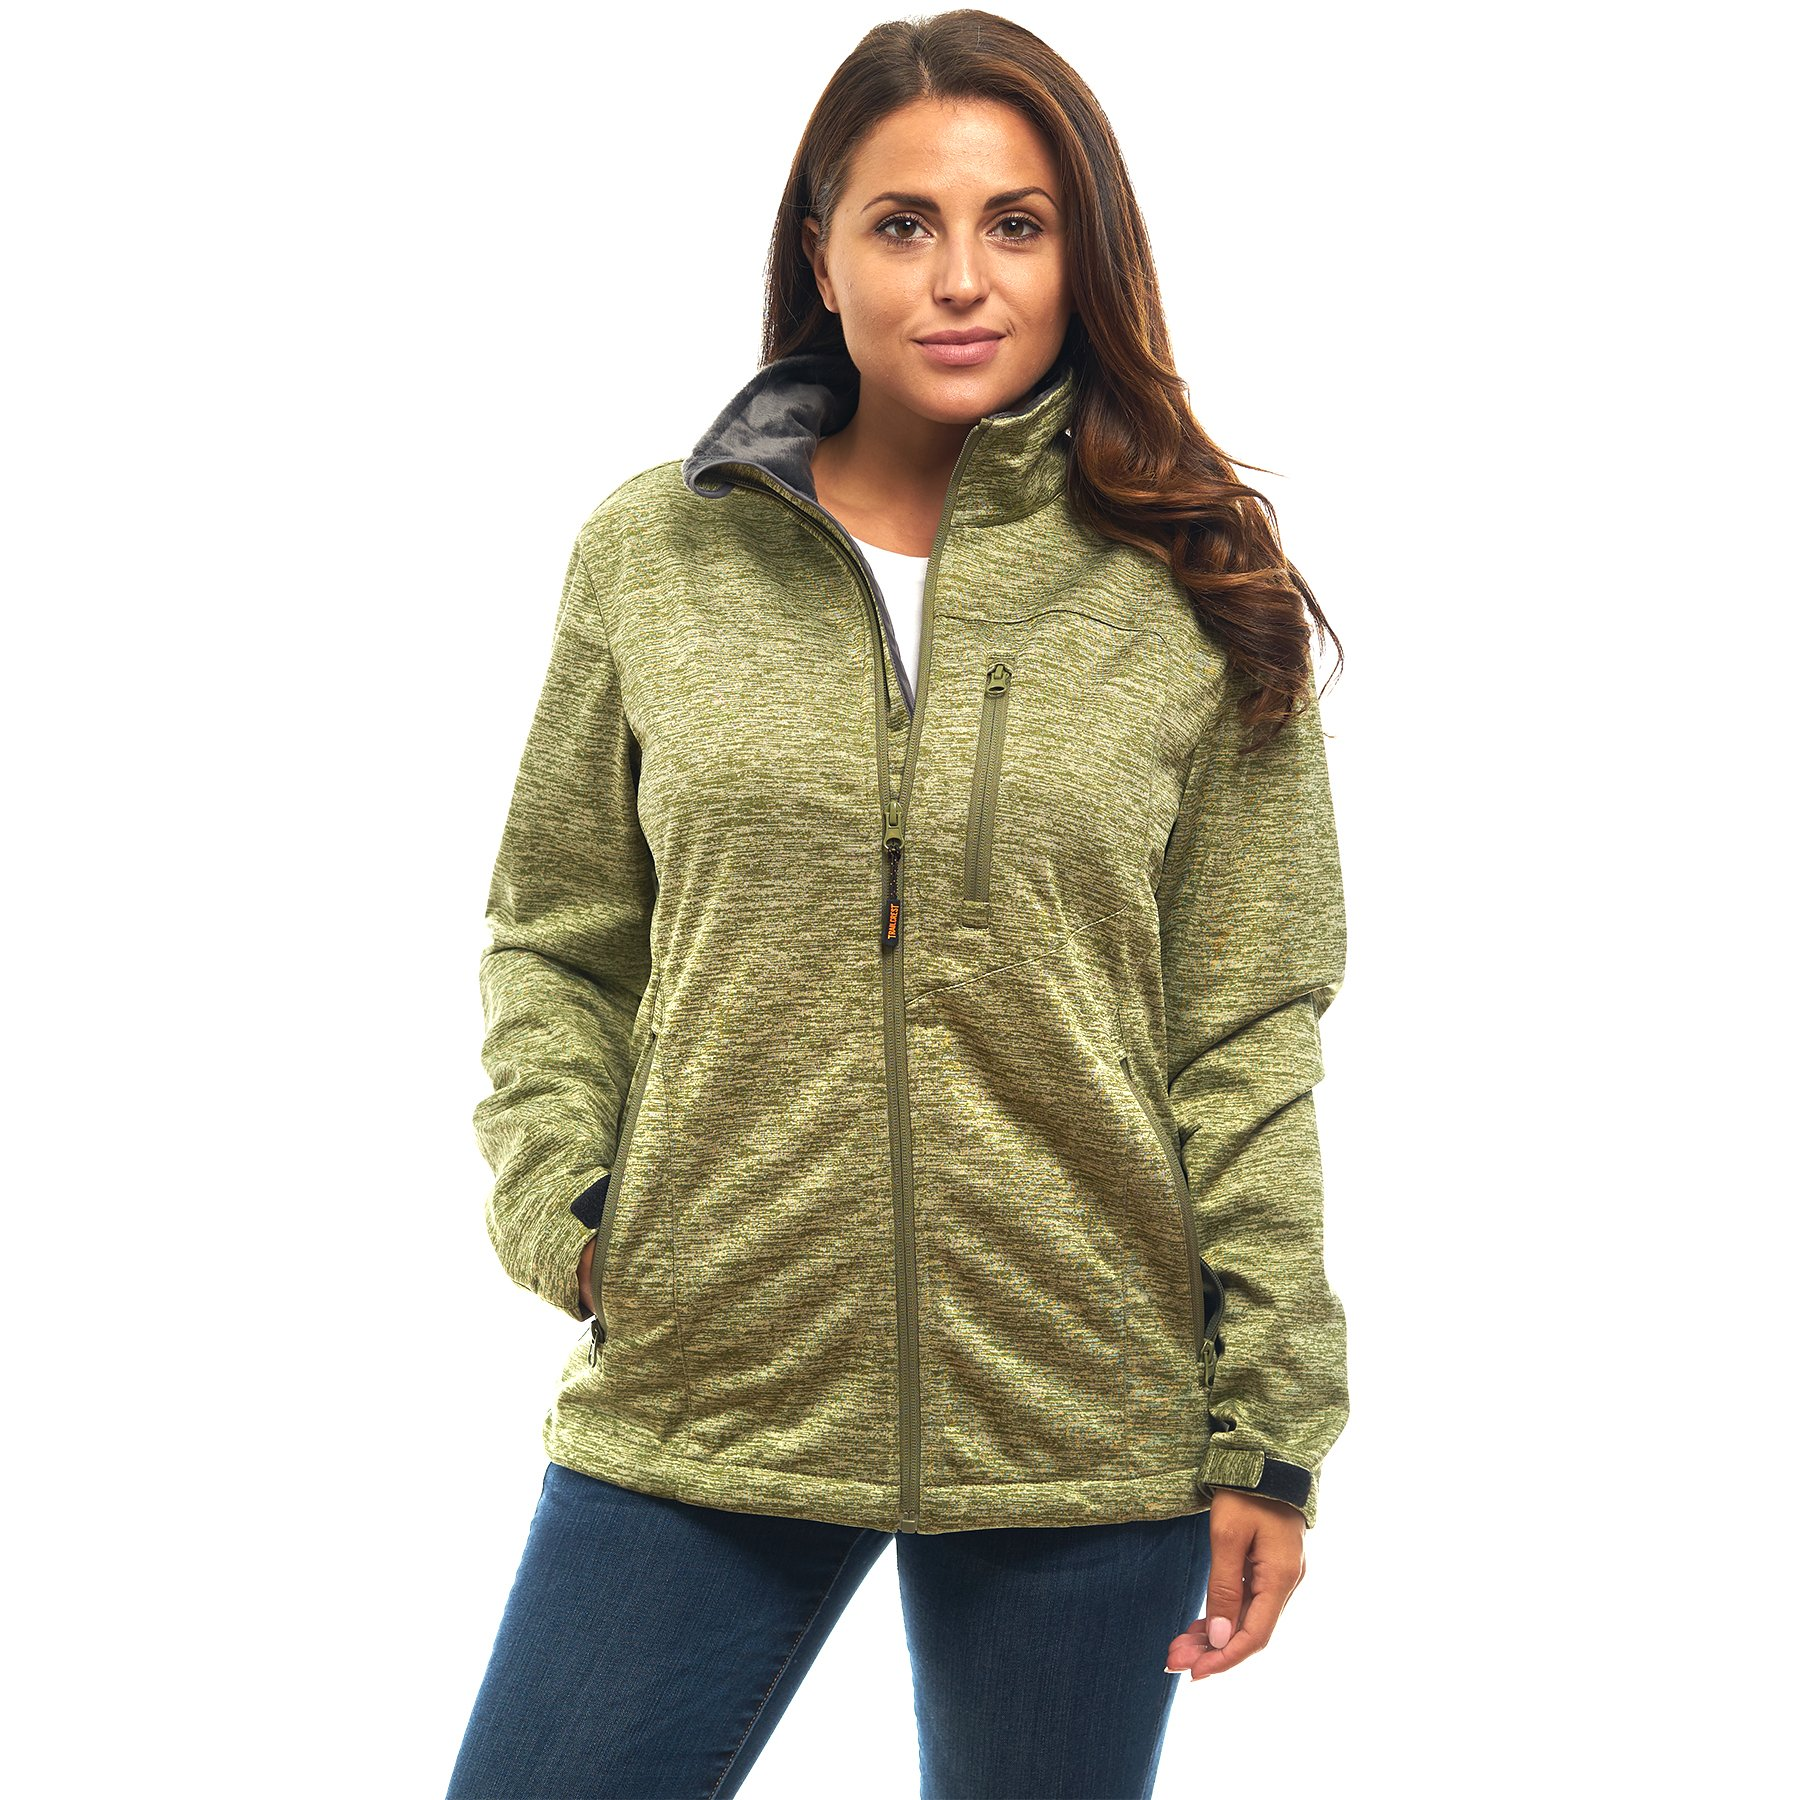 TrailCrest Women's Softshell Hooded Jacket - Super Soft Plush Coral Fleece Lining- Full Zipper